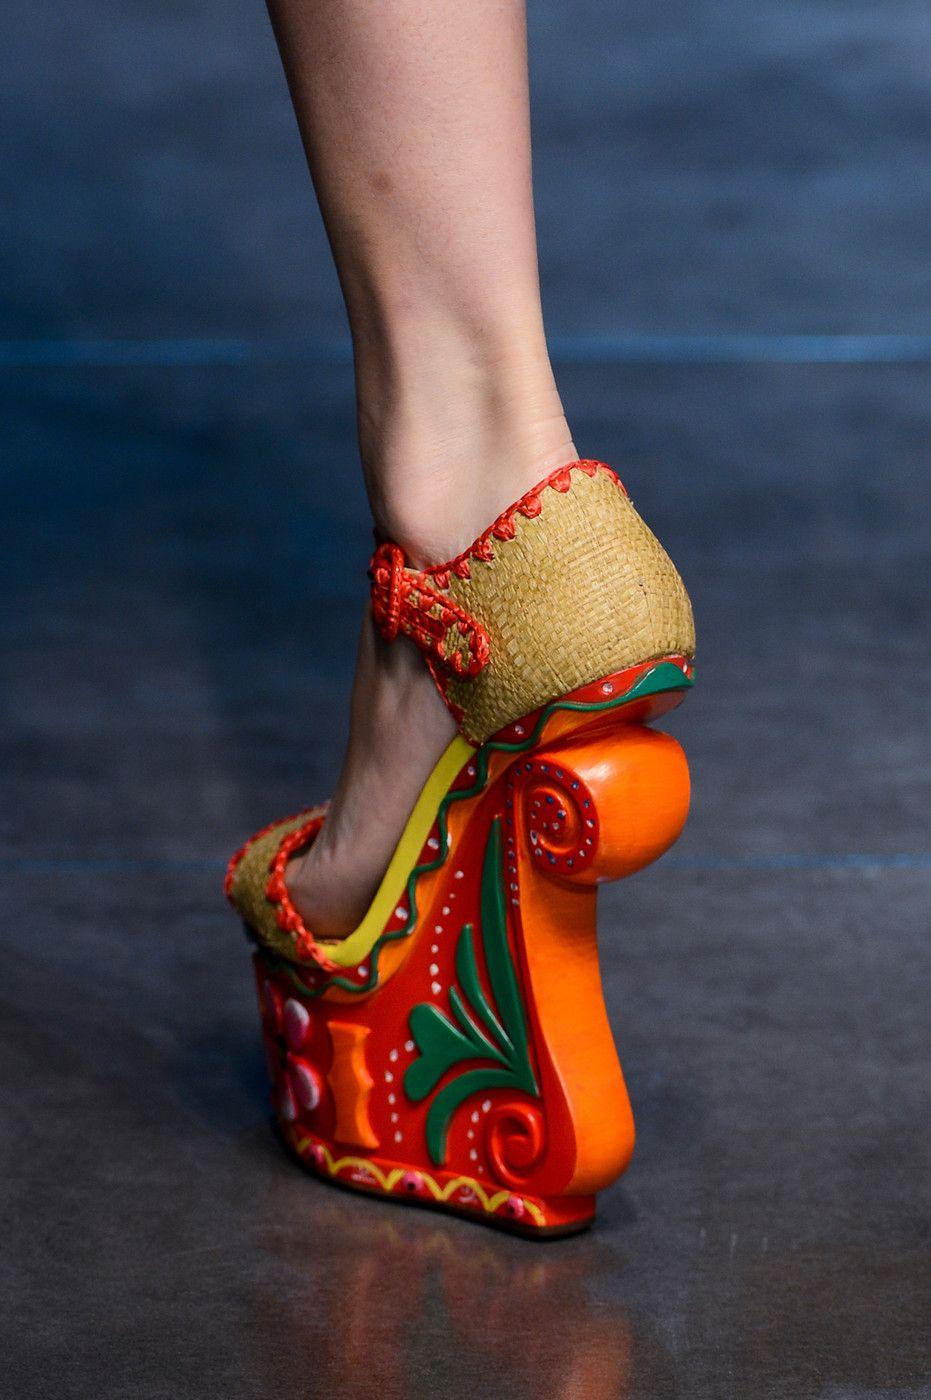 Dolce & Gabbana Spring 2013 Ready-to-Wear Detail | Shoes ... Дольче Габбана Обувь 2013